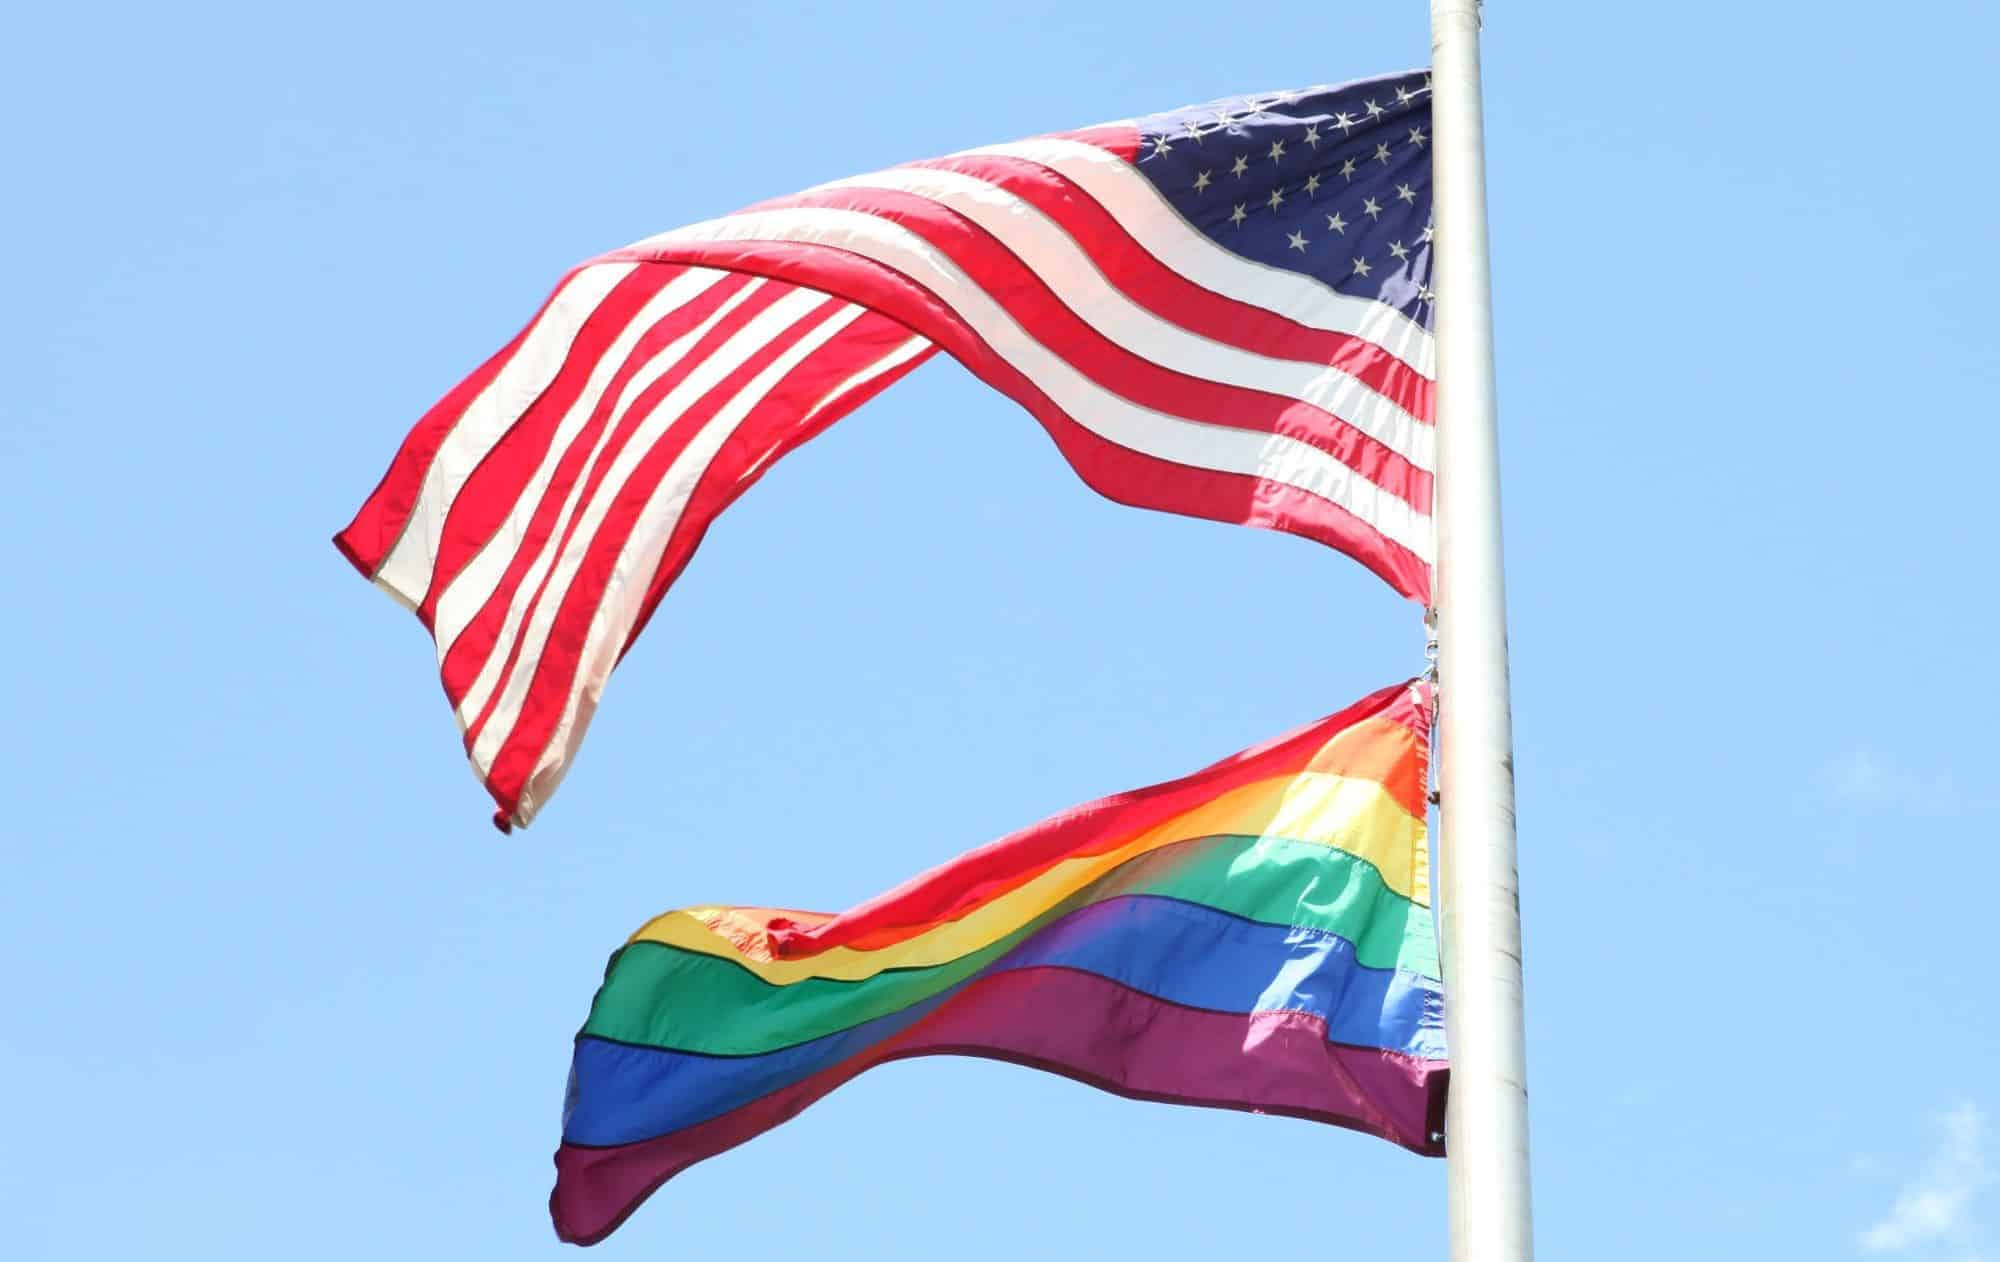 The Pride Flag at the U.S. Embassy in San Jose, Costa Rica